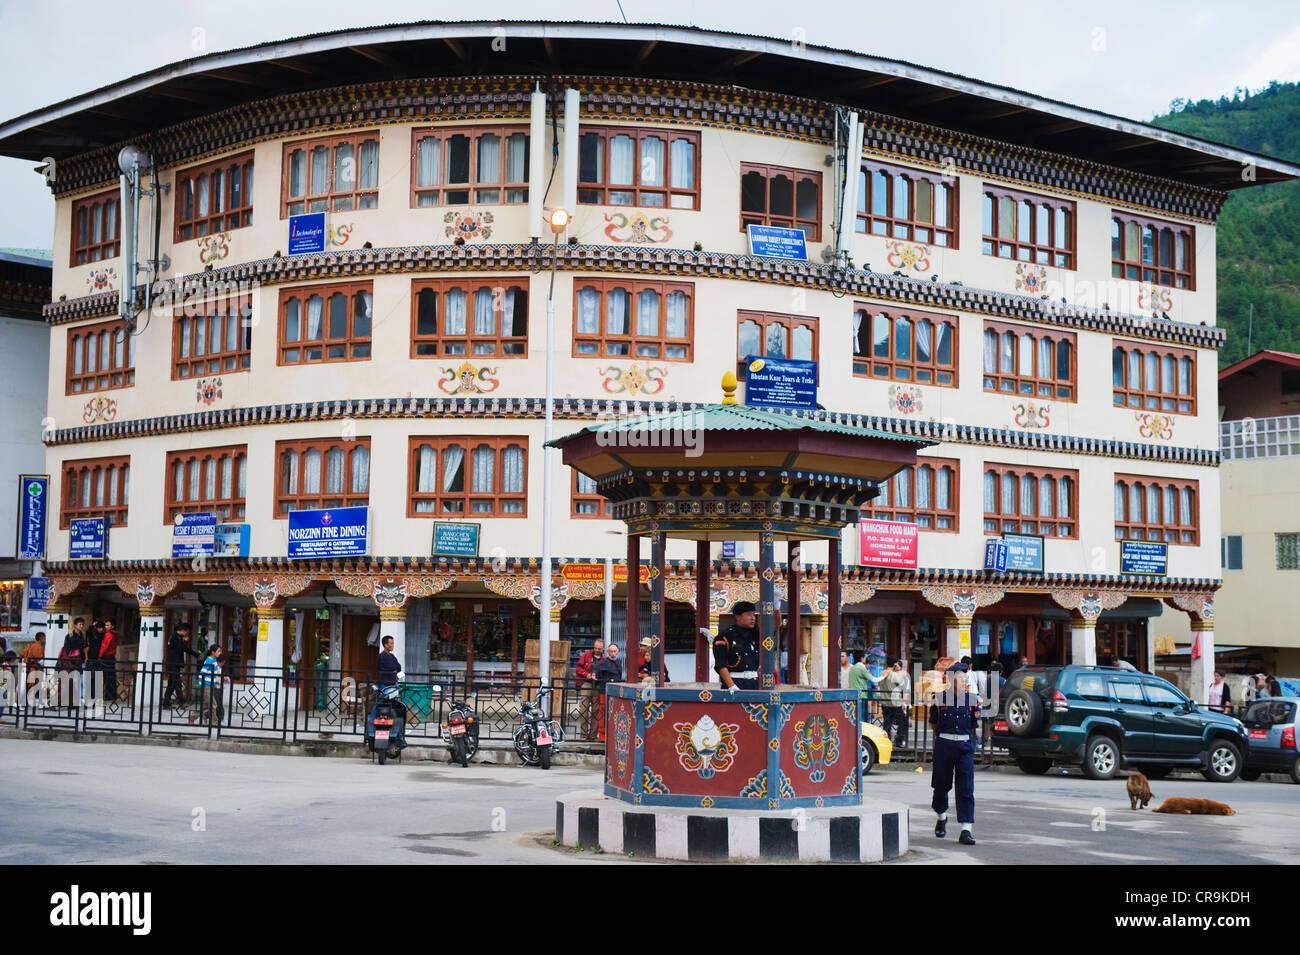 Polizei handbetrieben Kreisverkehr, Thimphu (Hauptstadt), Bhutan, Asien Stockbild